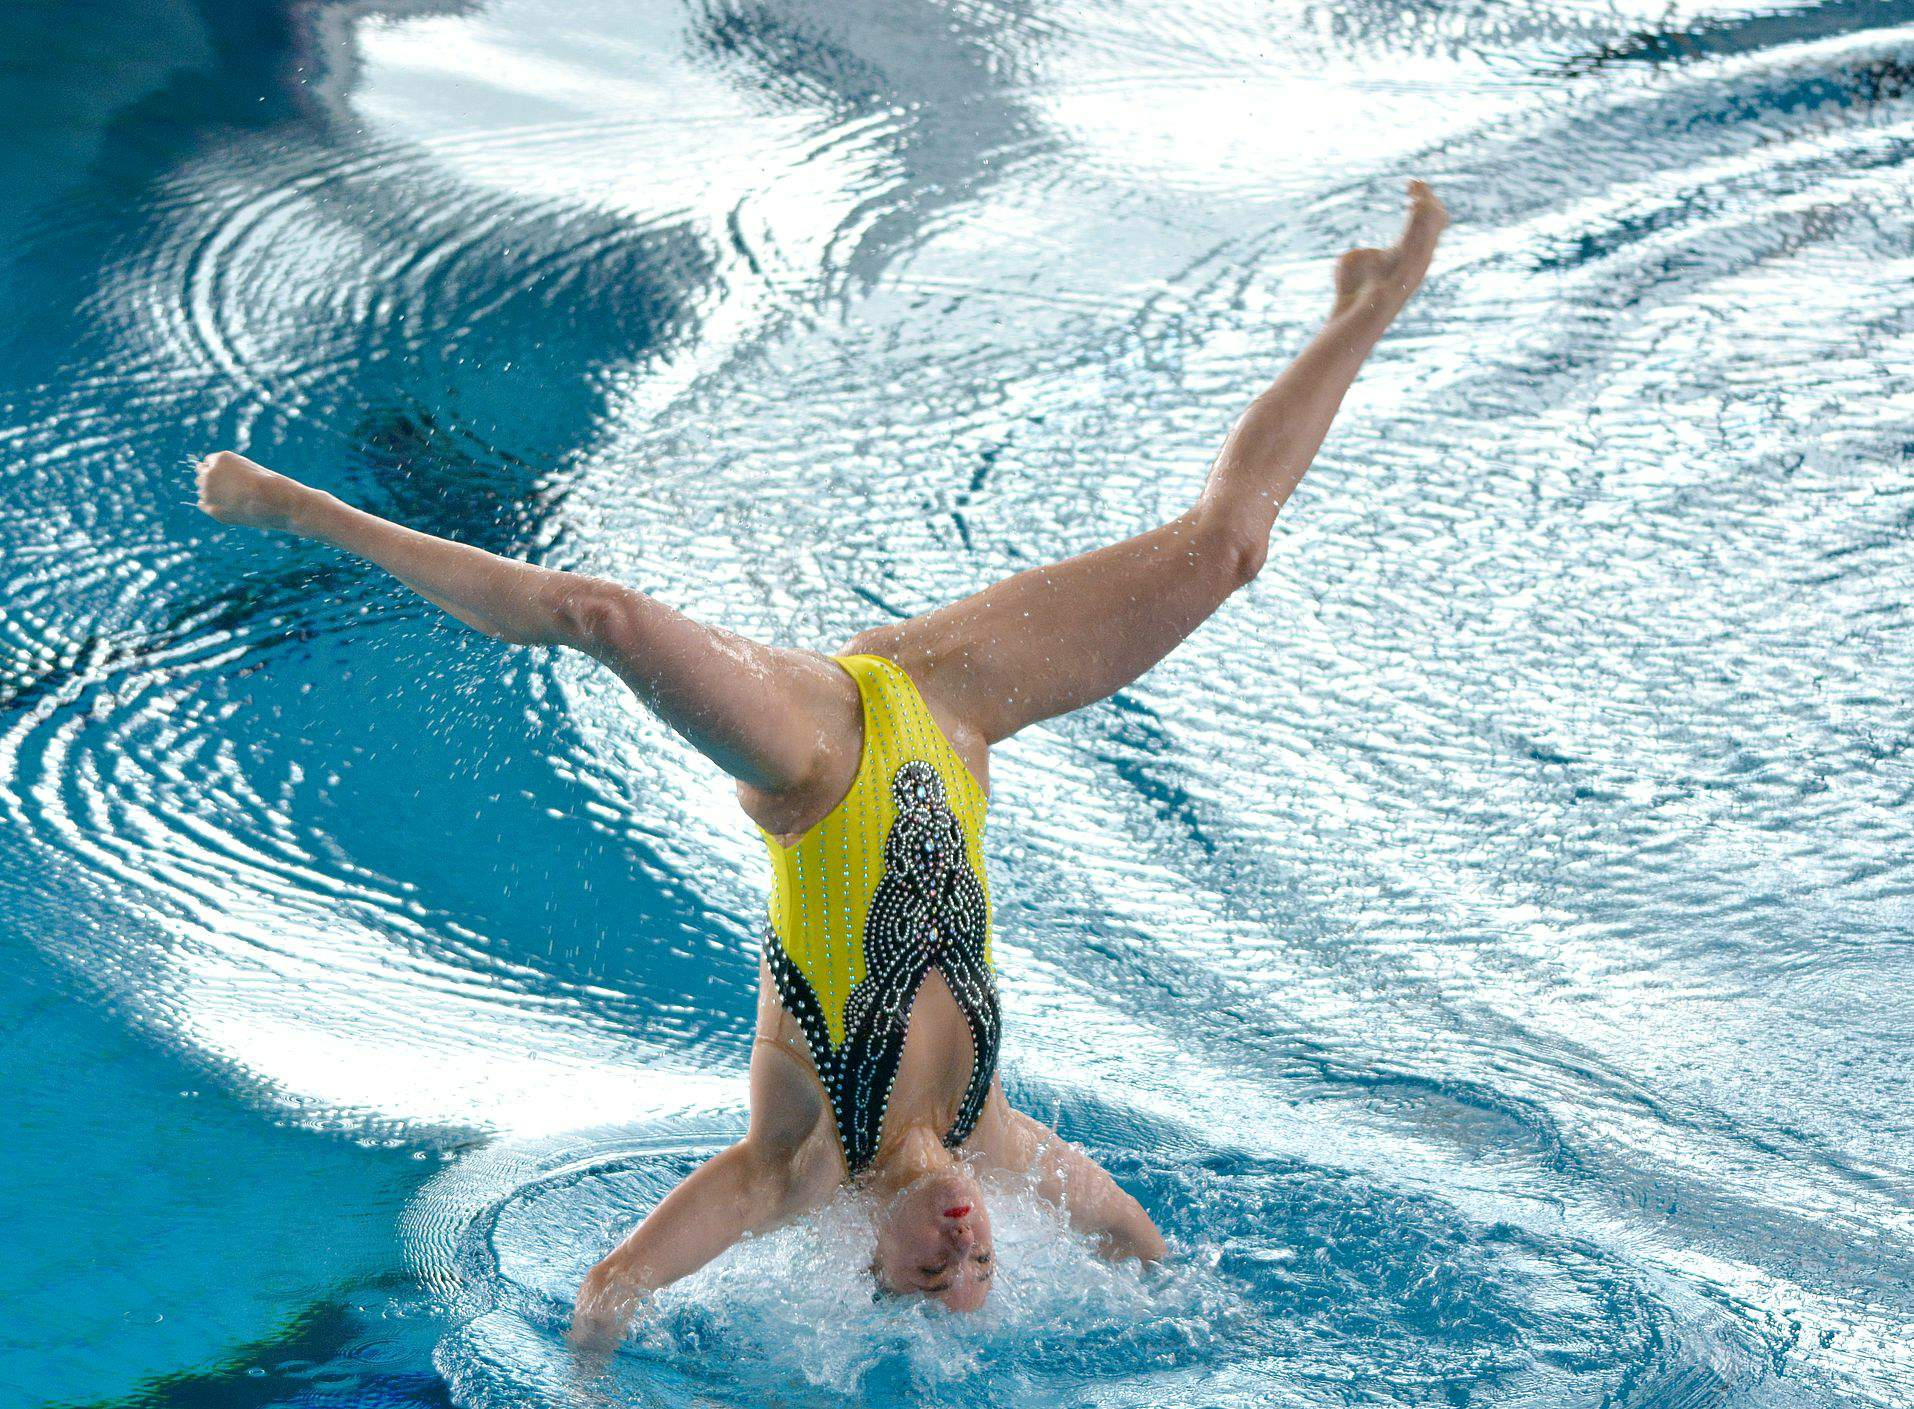 .rajce.idnes.cz children swim